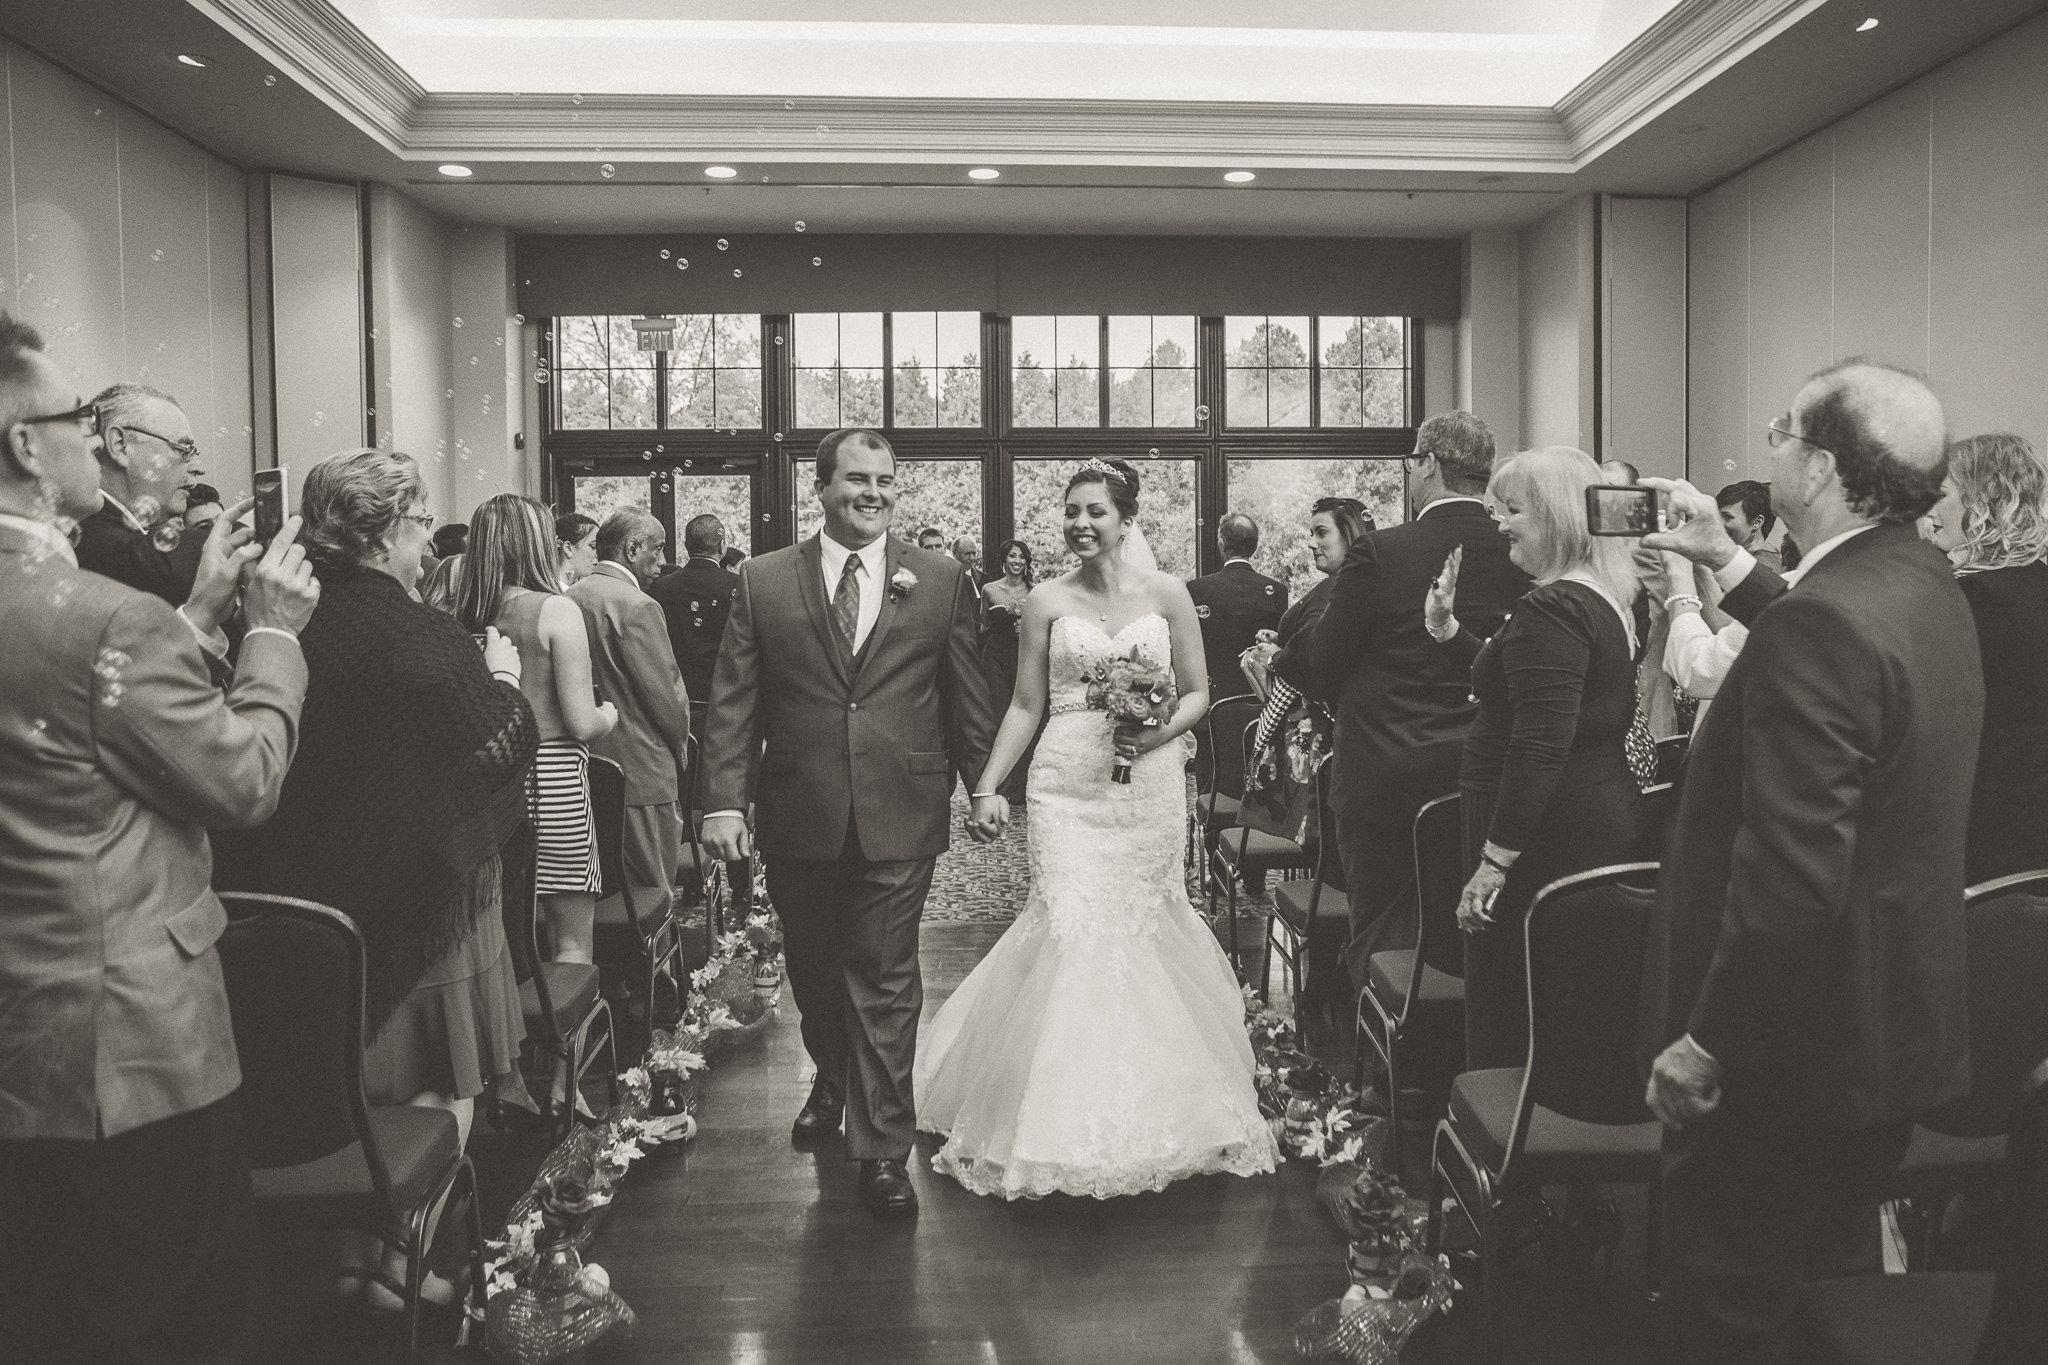 deer creek banquet facility wedding photos 574 - Deer Creek Wedding Photos